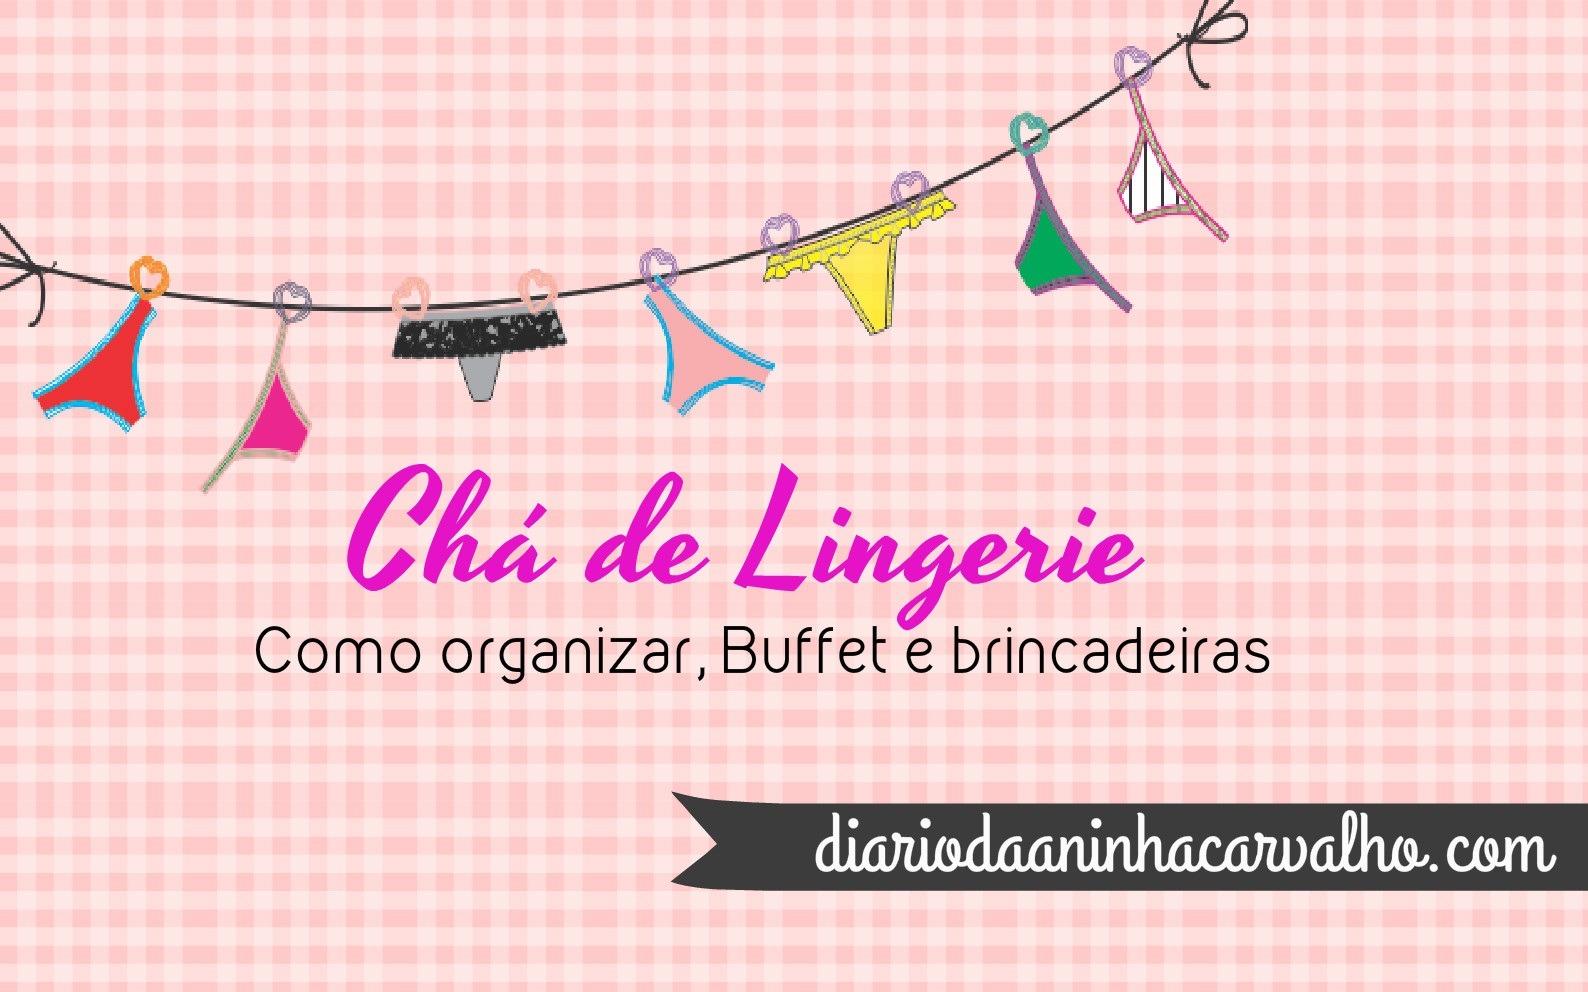 Chá-de-lingerie-como-organizar-buffet-brincadeiras